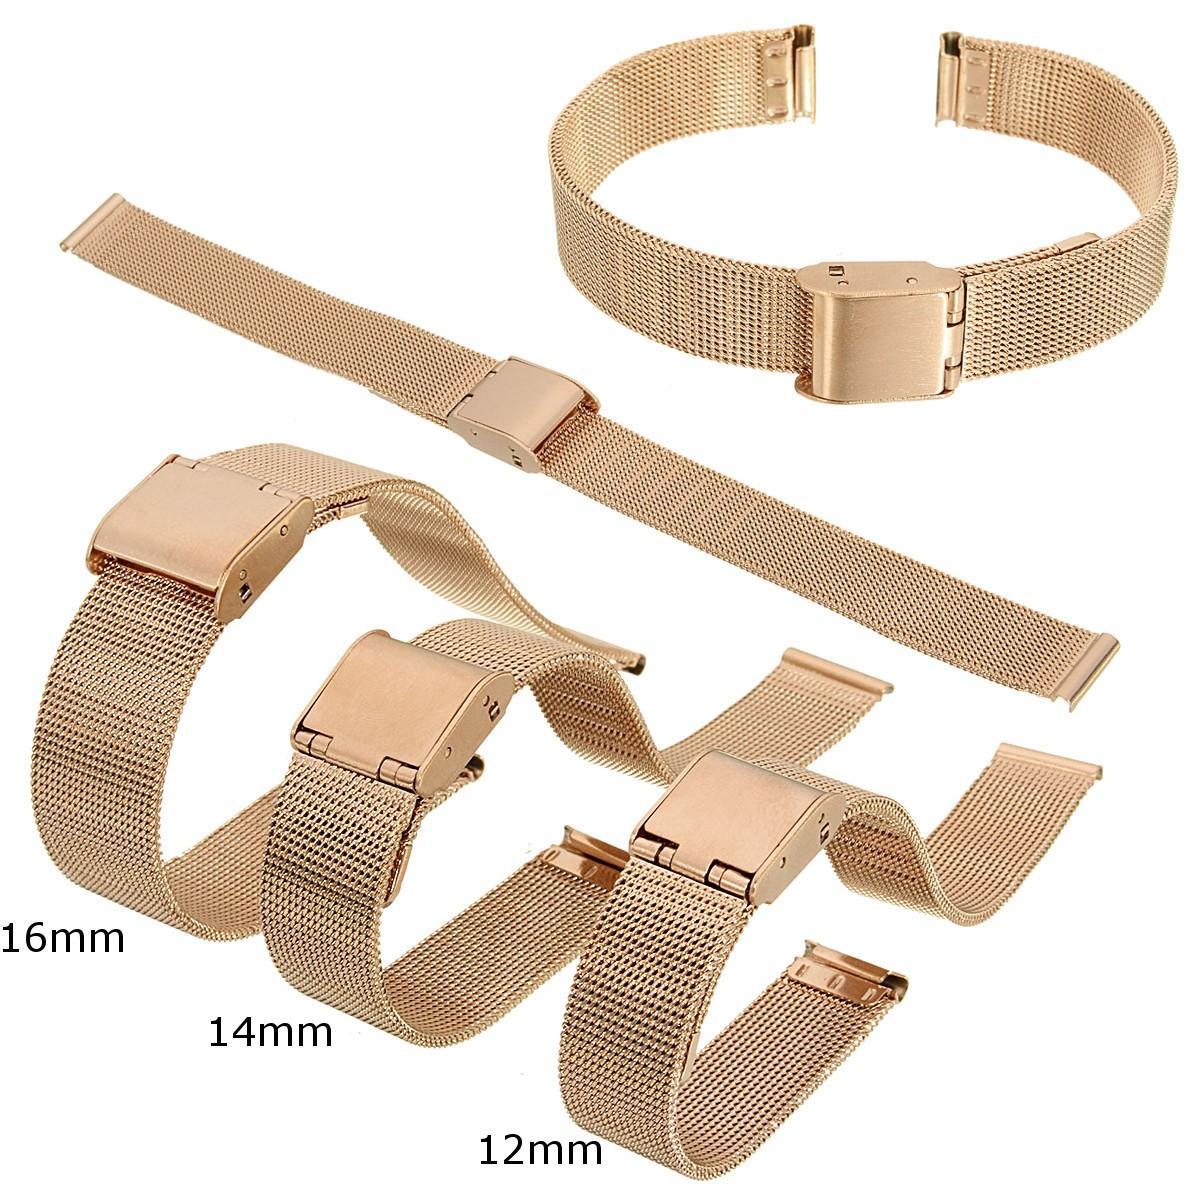 16mm Stainless Steel Mesh Wristwatch Band Straps Watch BraceletsRepair